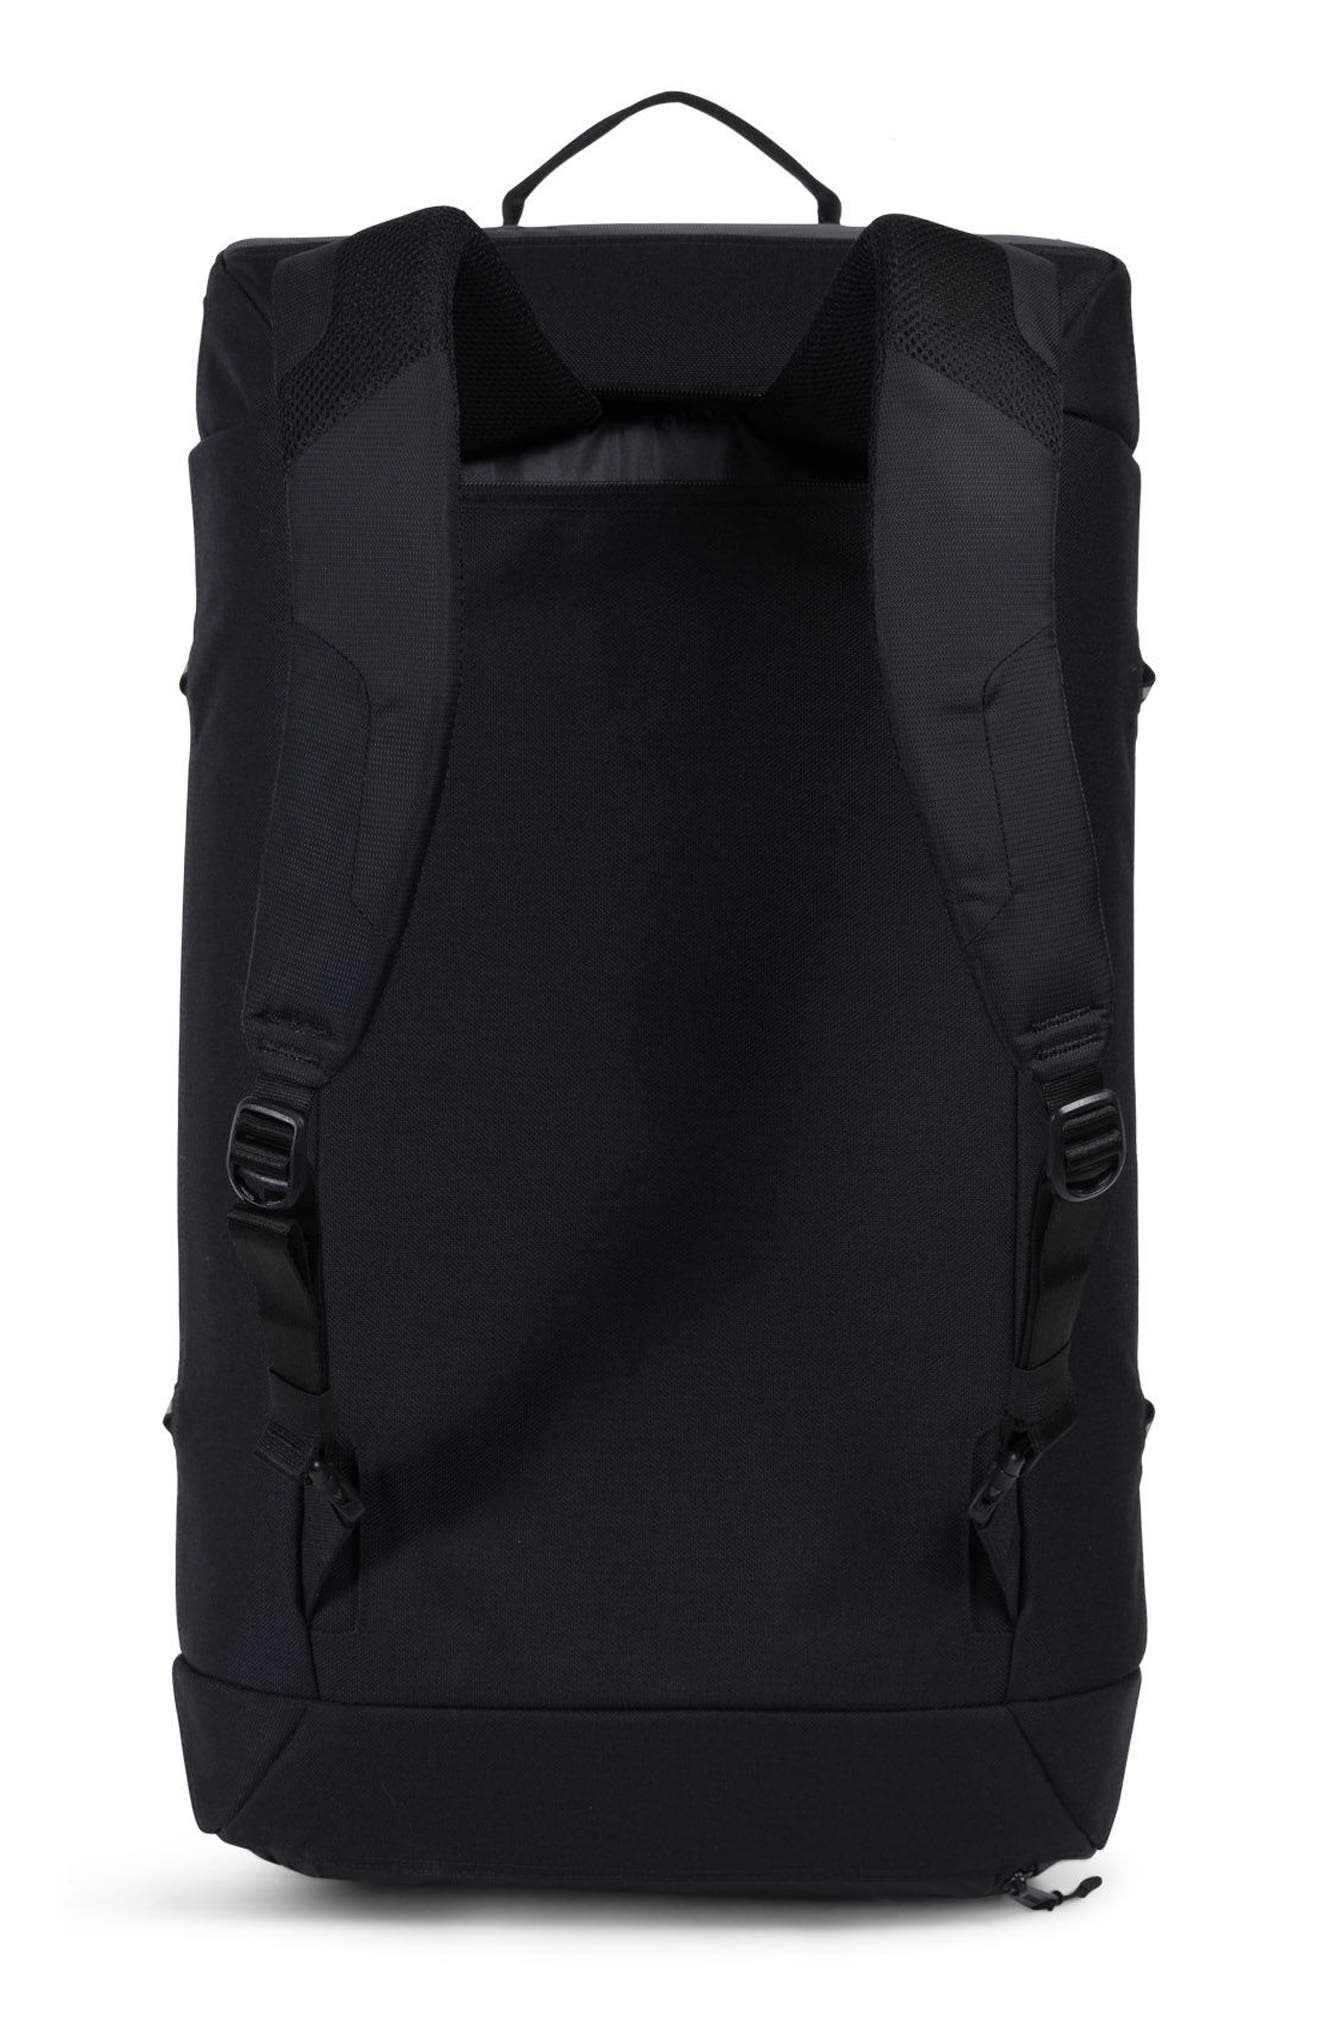 Trail Gorge Duffel Bag,                             Alternate thumbnail 2, color,                             Black